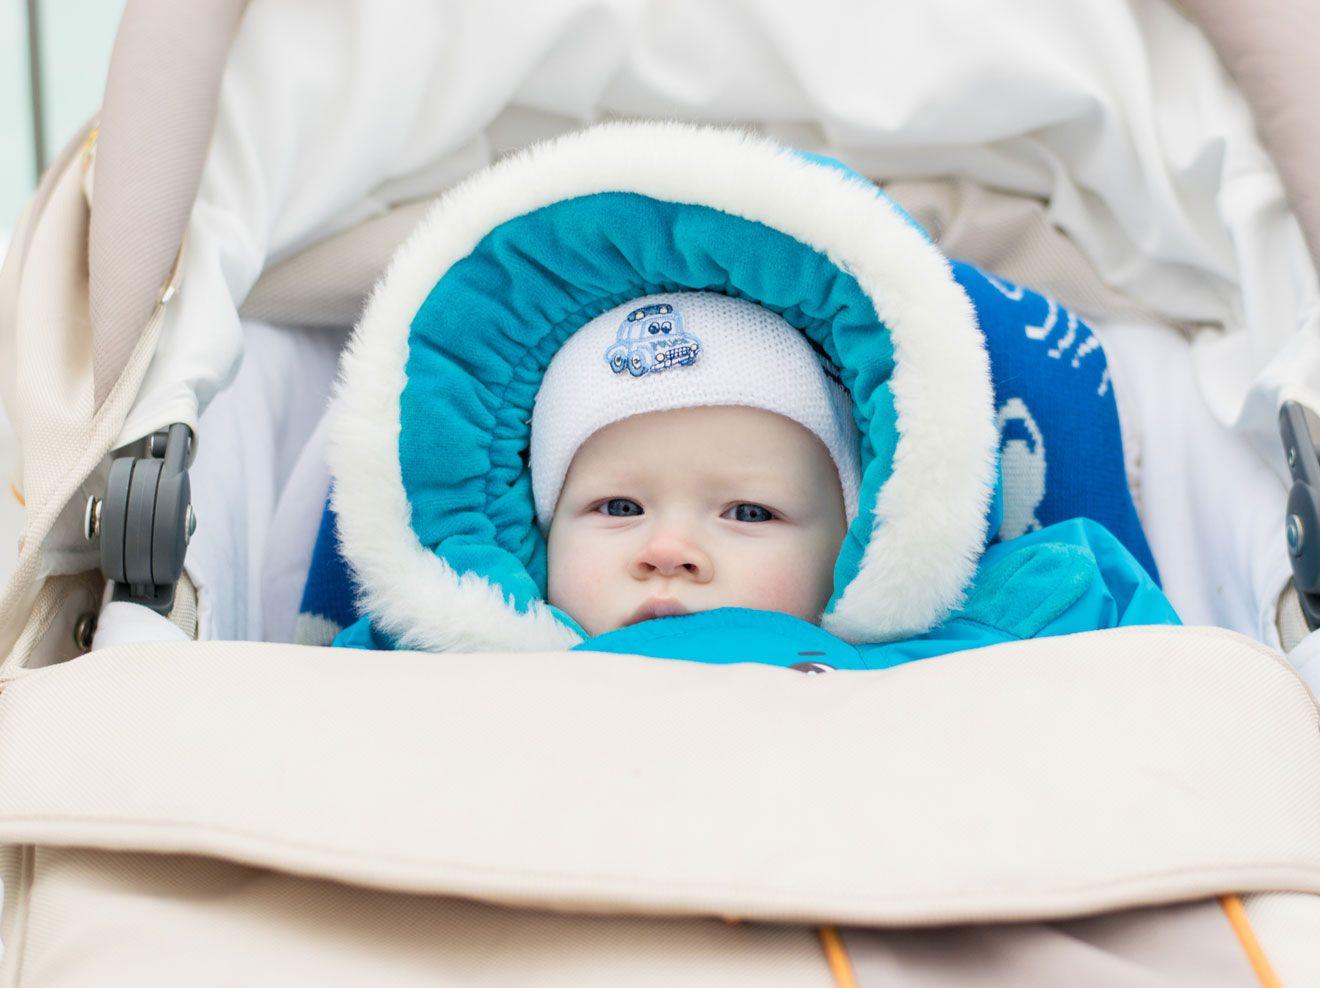 Baby Anziehen 15 Grad